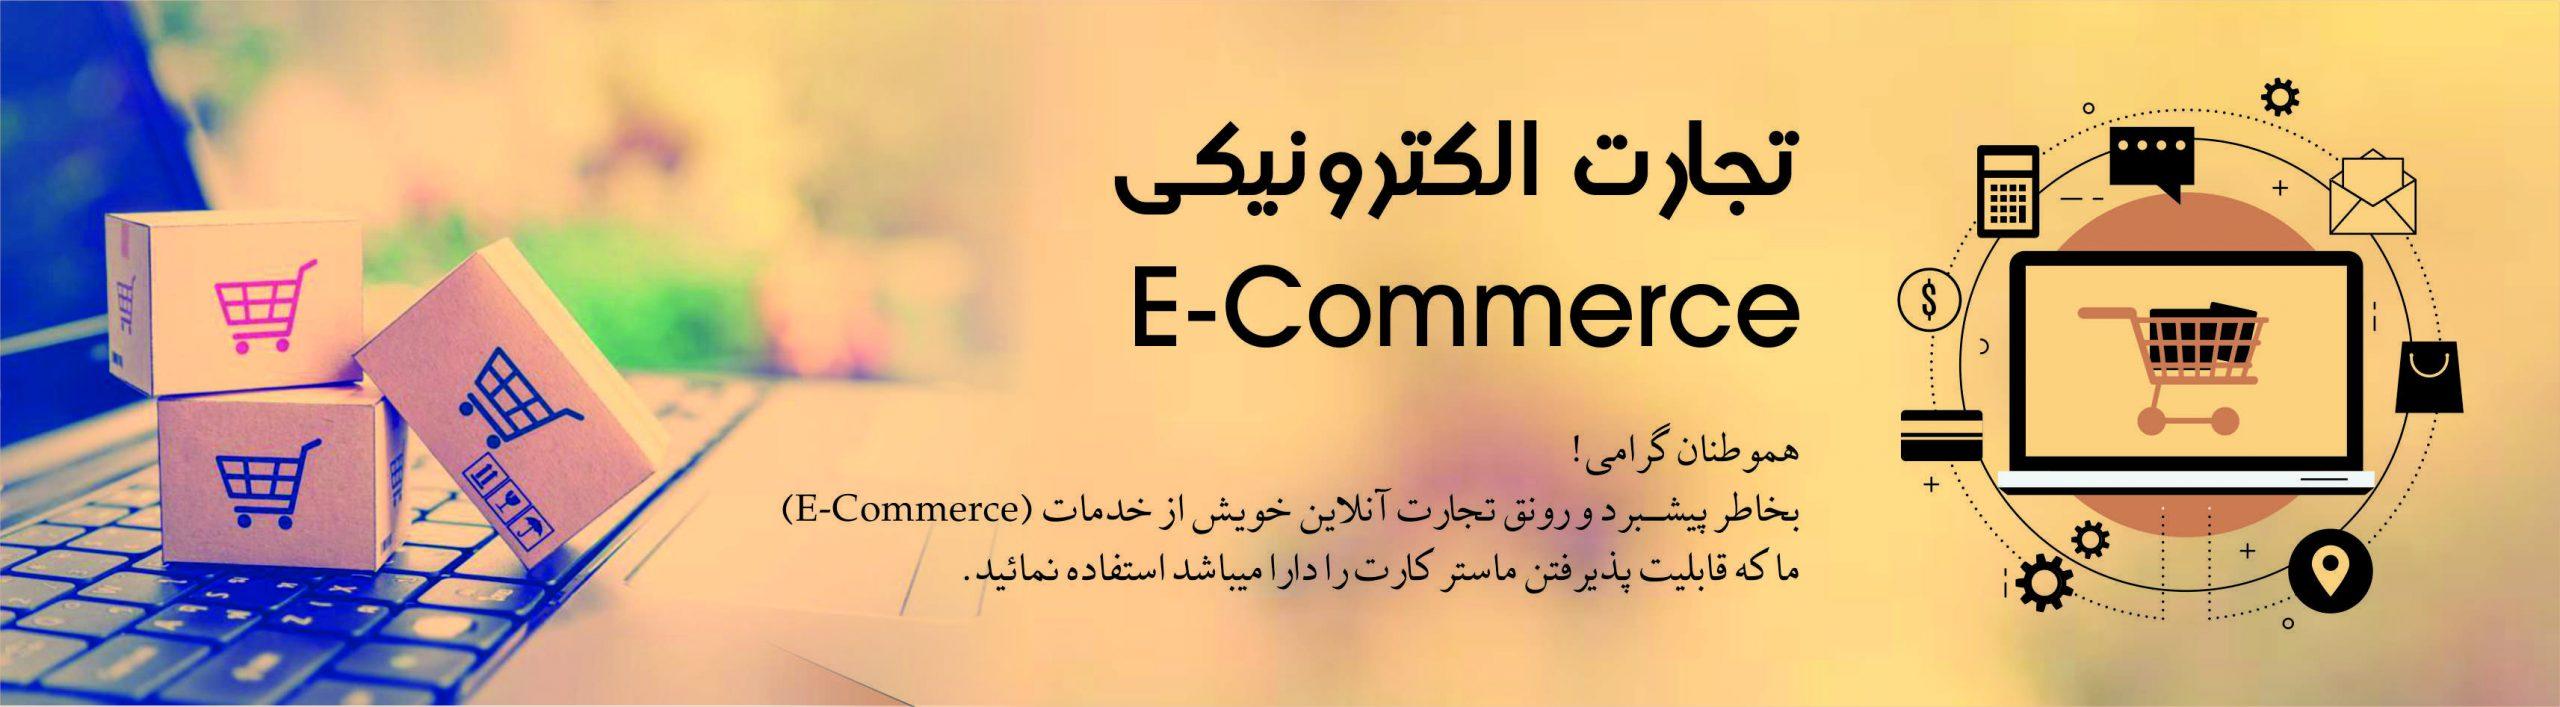 E-Commerce-scaled